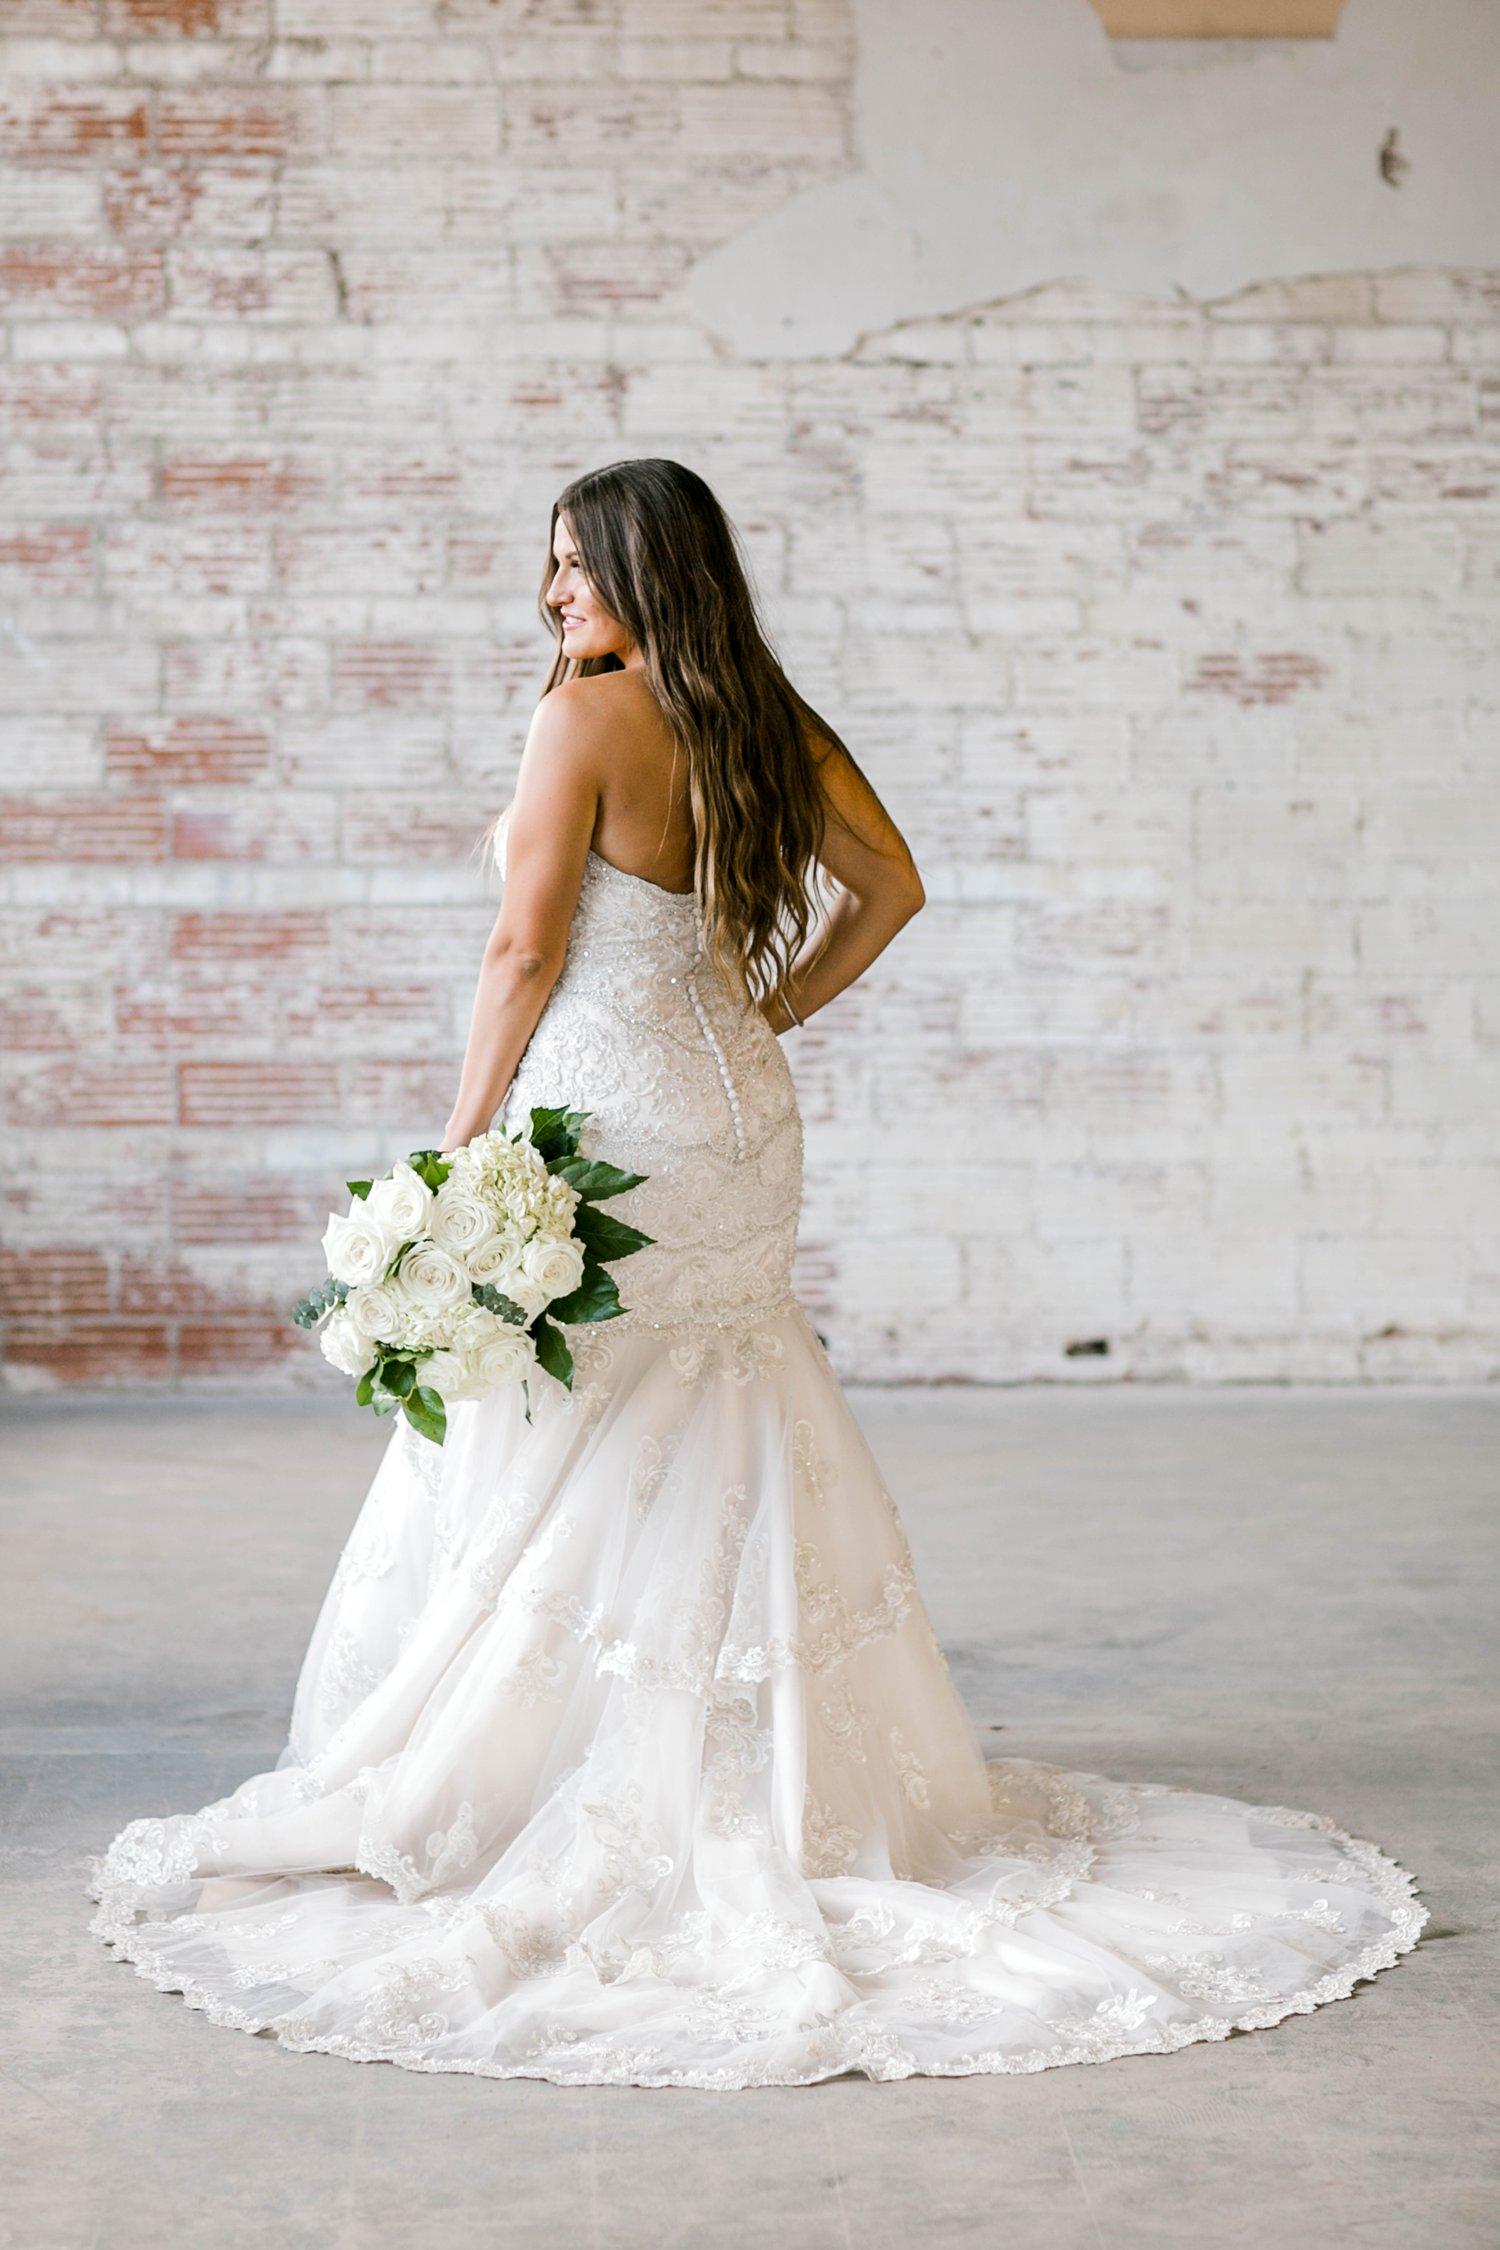 Kendra_Hill_Bridals_ALLEEJ_Lubbock_Wedding_Photographer_LHUCA_0024.jpg